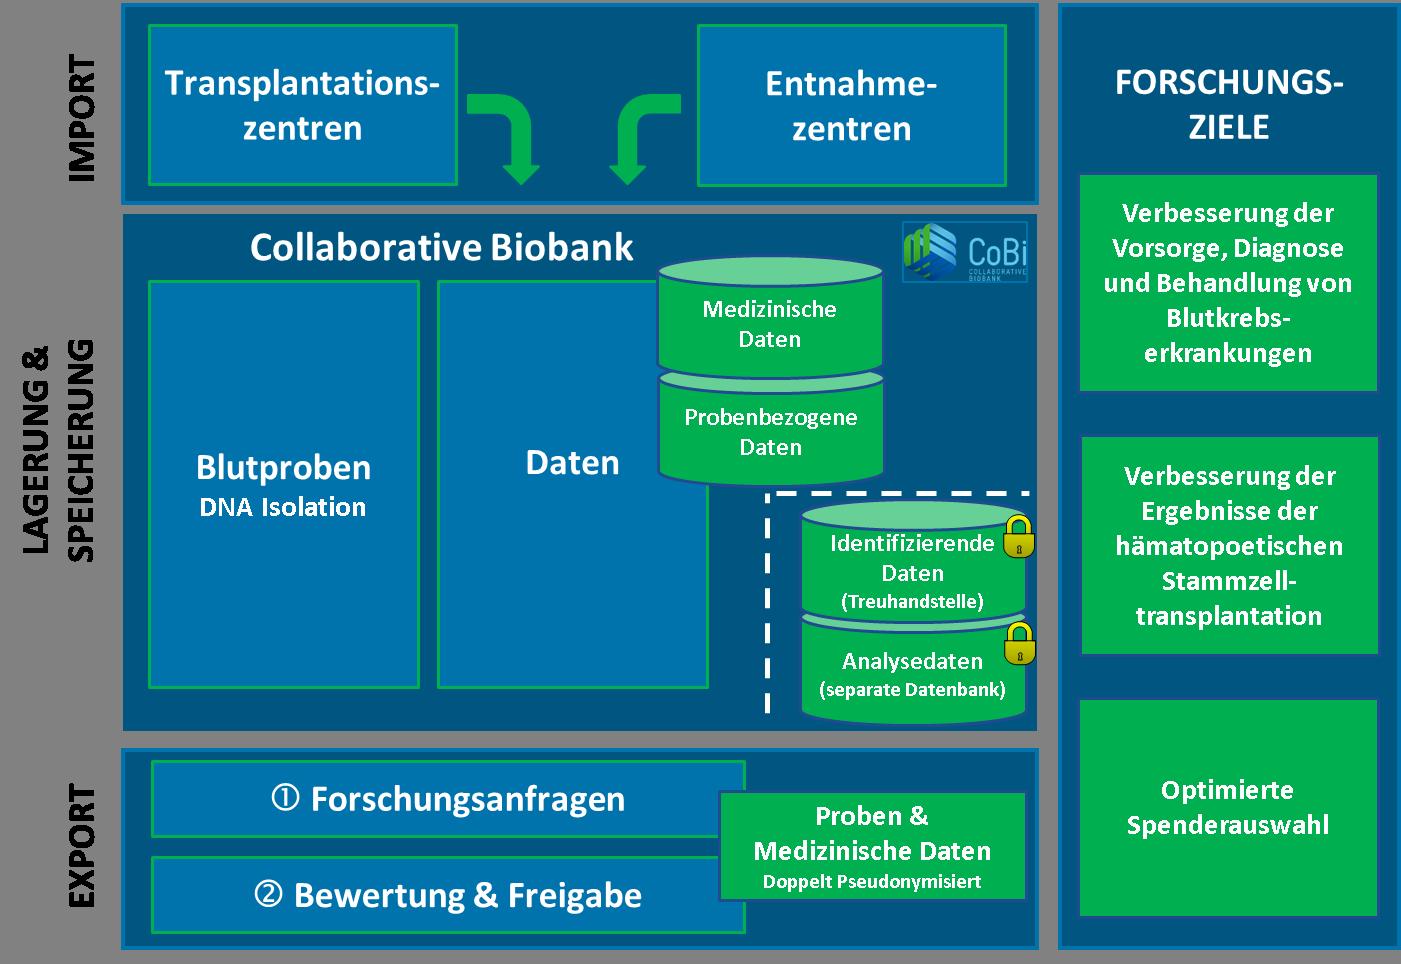 Grafik Infrastructure mit Forschungszielen